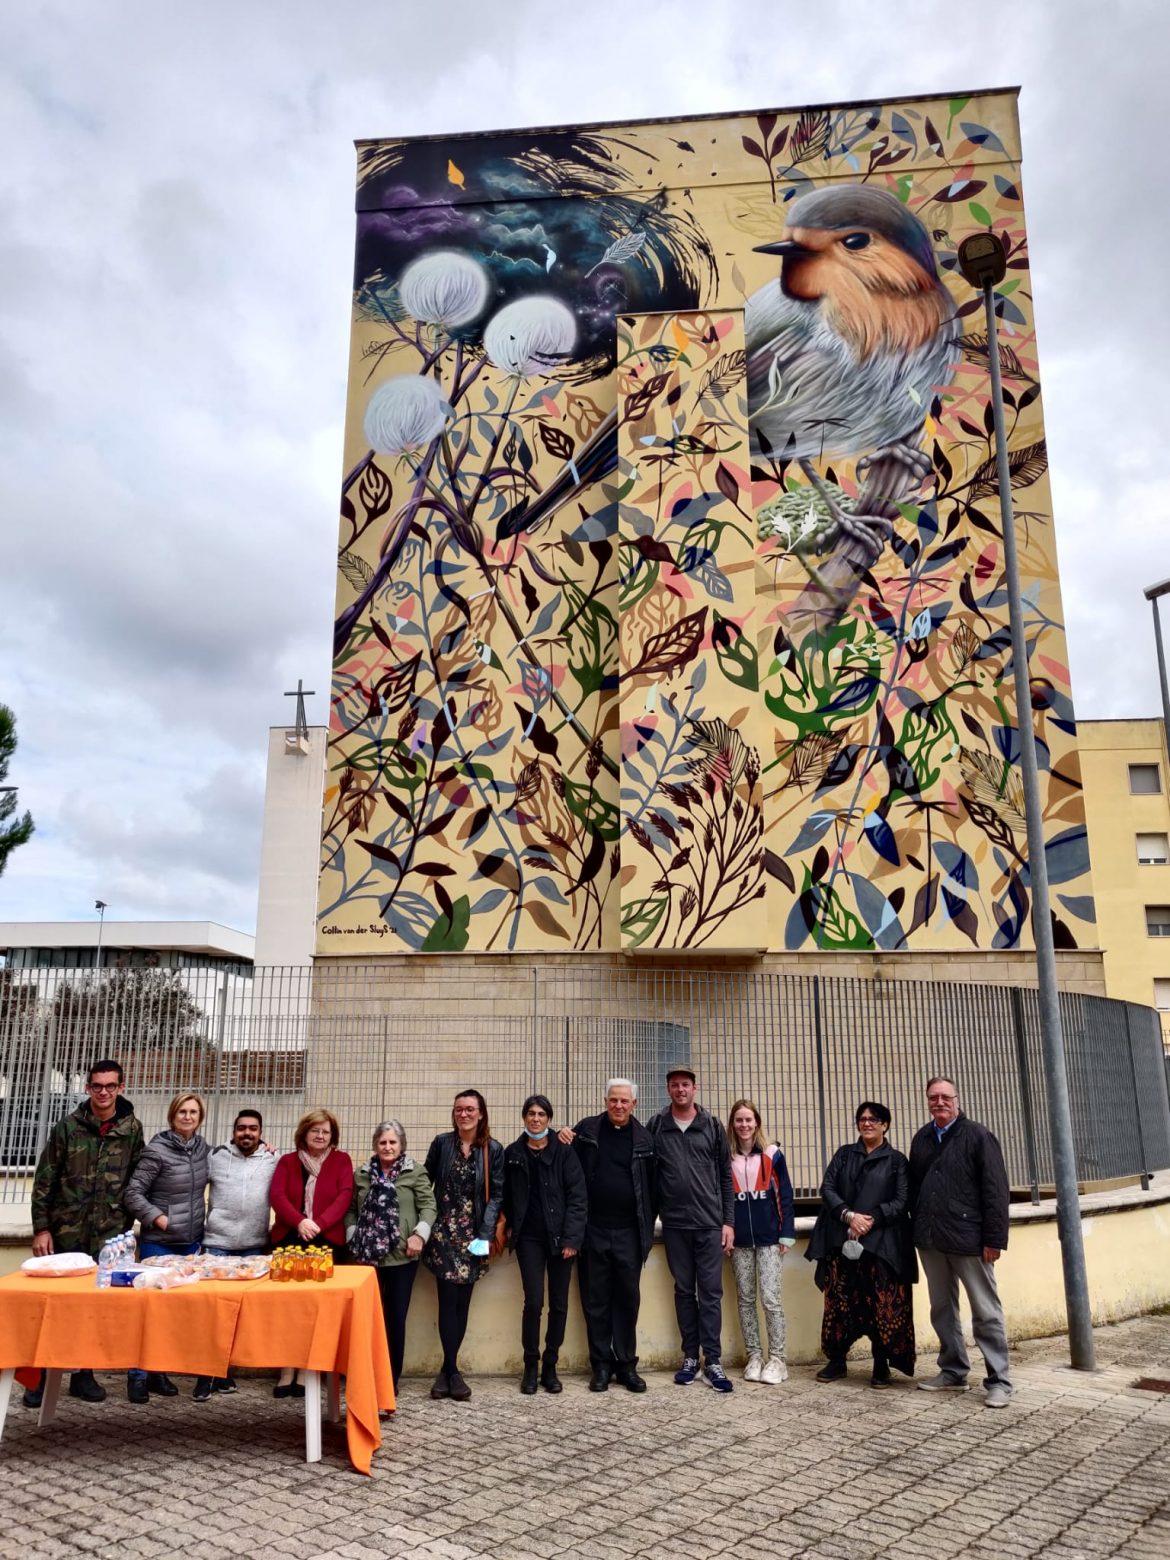 HollAndMe, l'artista Collin Van Der Sluijs firma murales nel quartiere Stadio